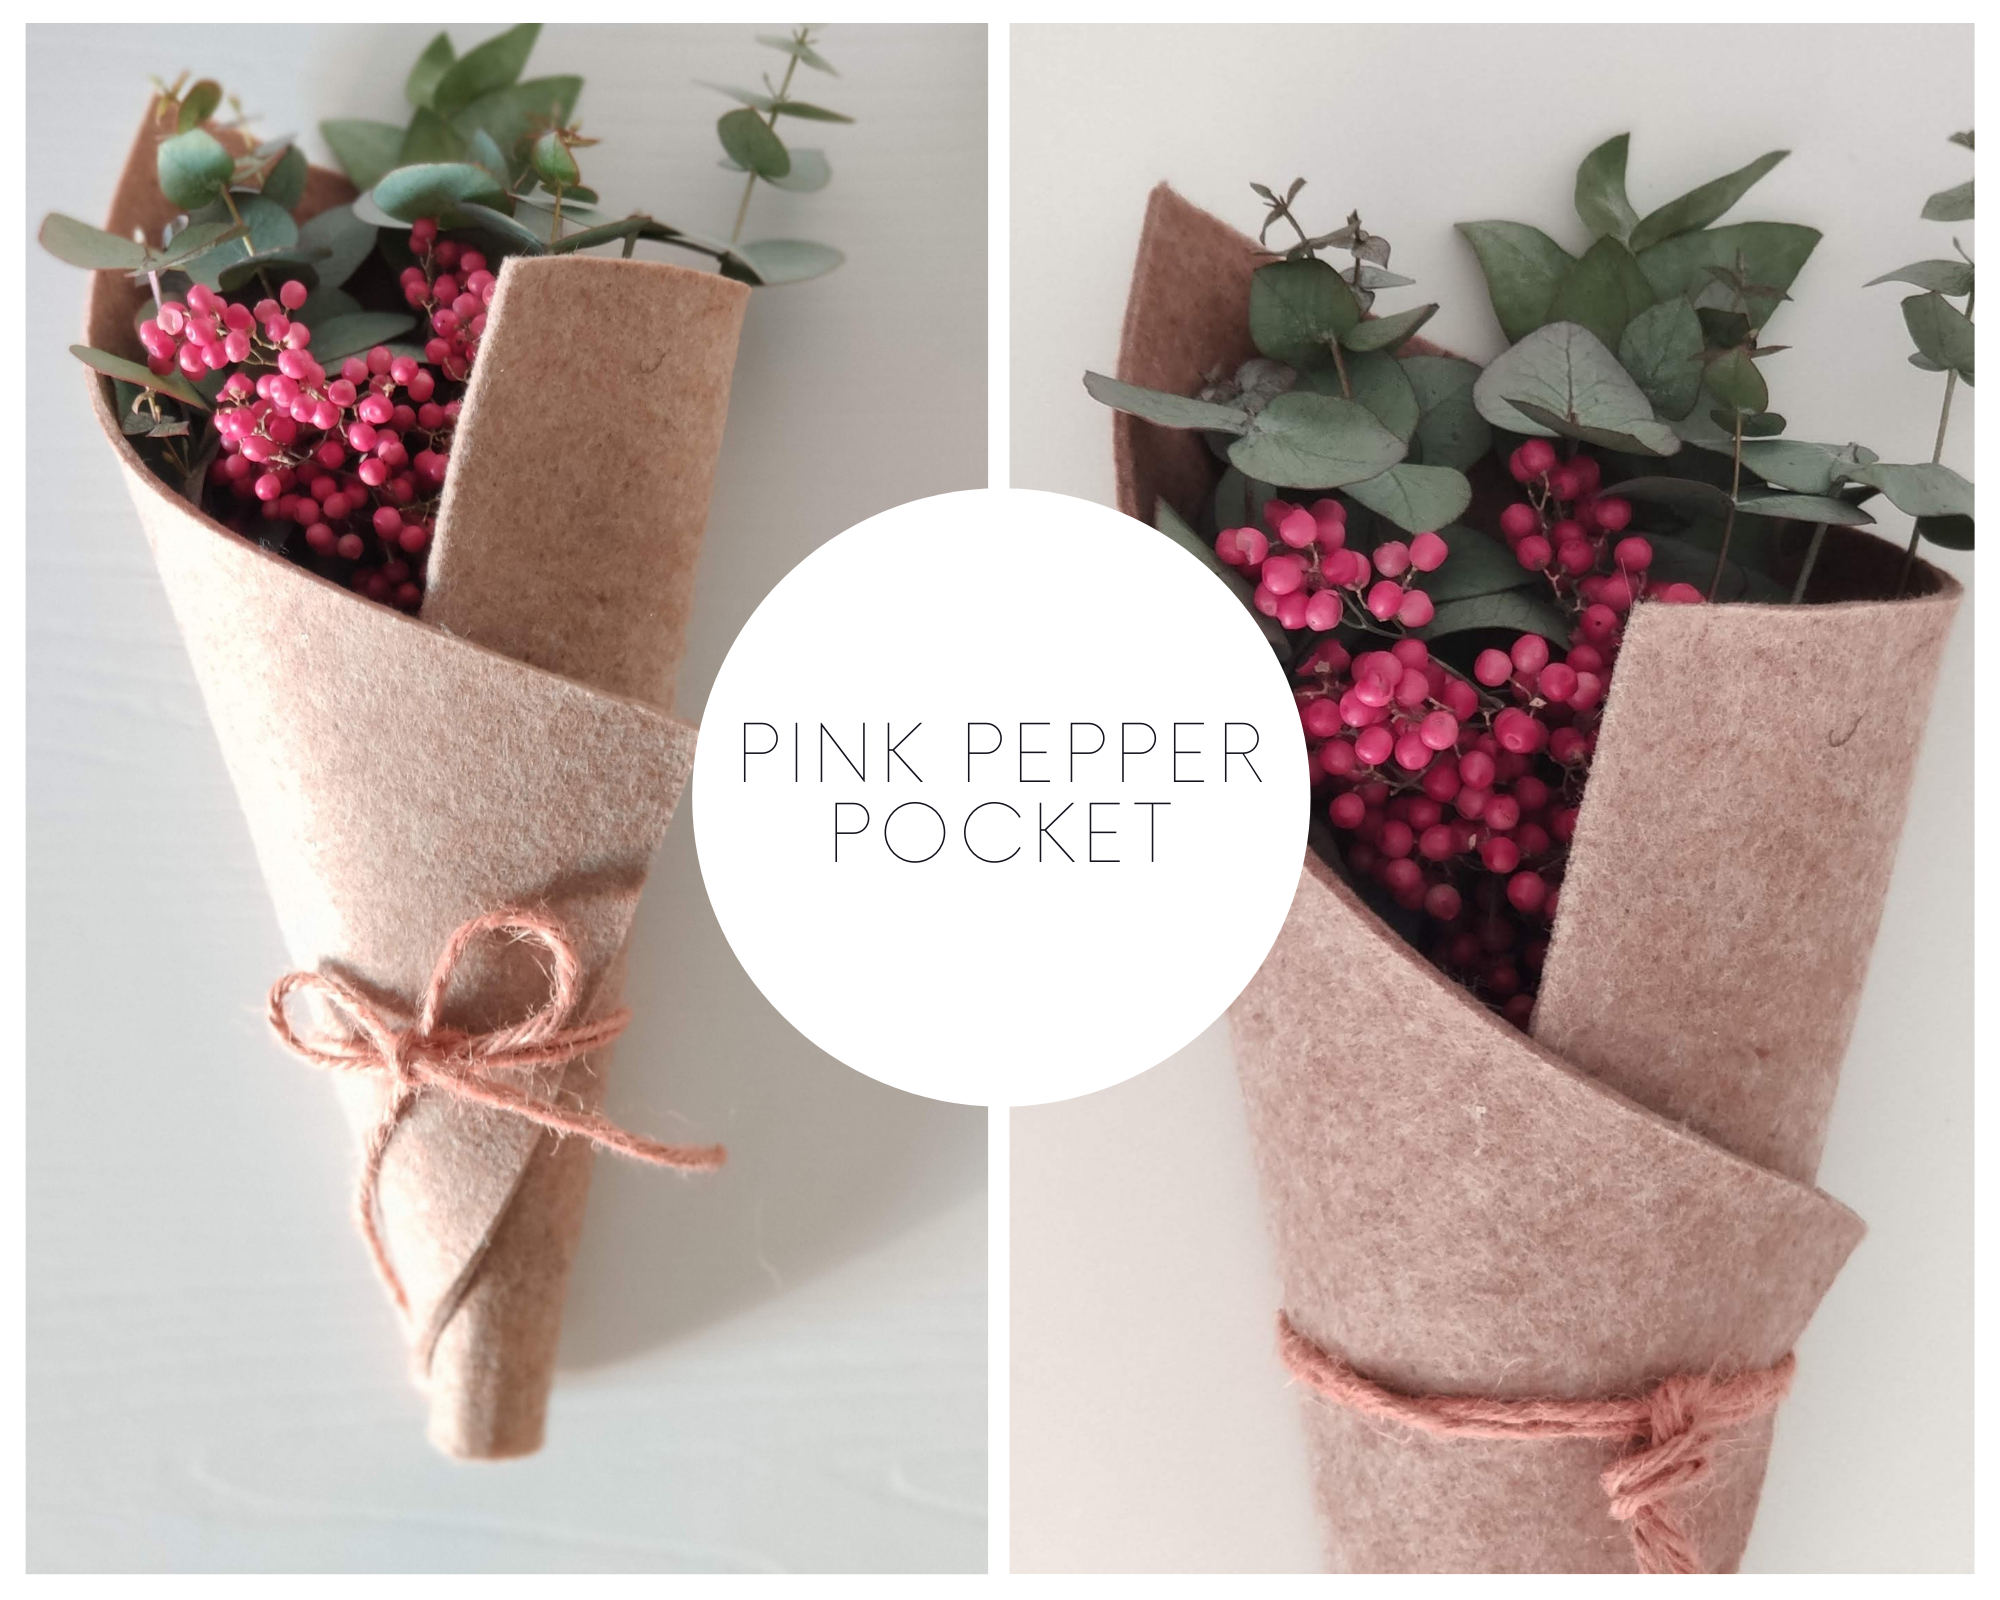 pink-pepper-pocket-laurorafloreale.it